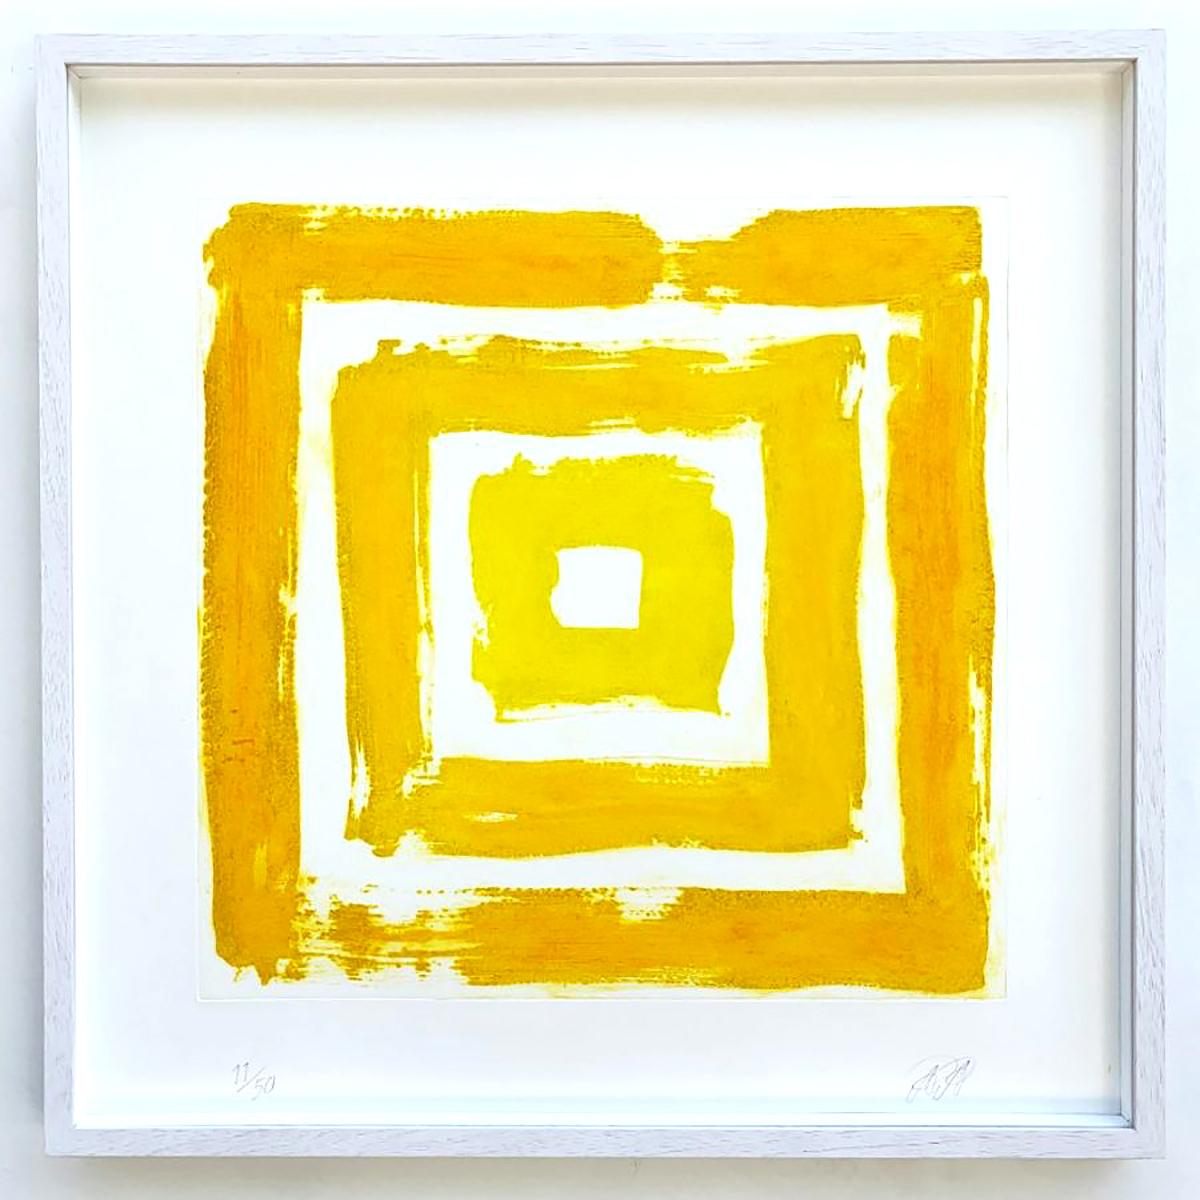 Alexander Arundell, 'Yellow Squares', carborundum